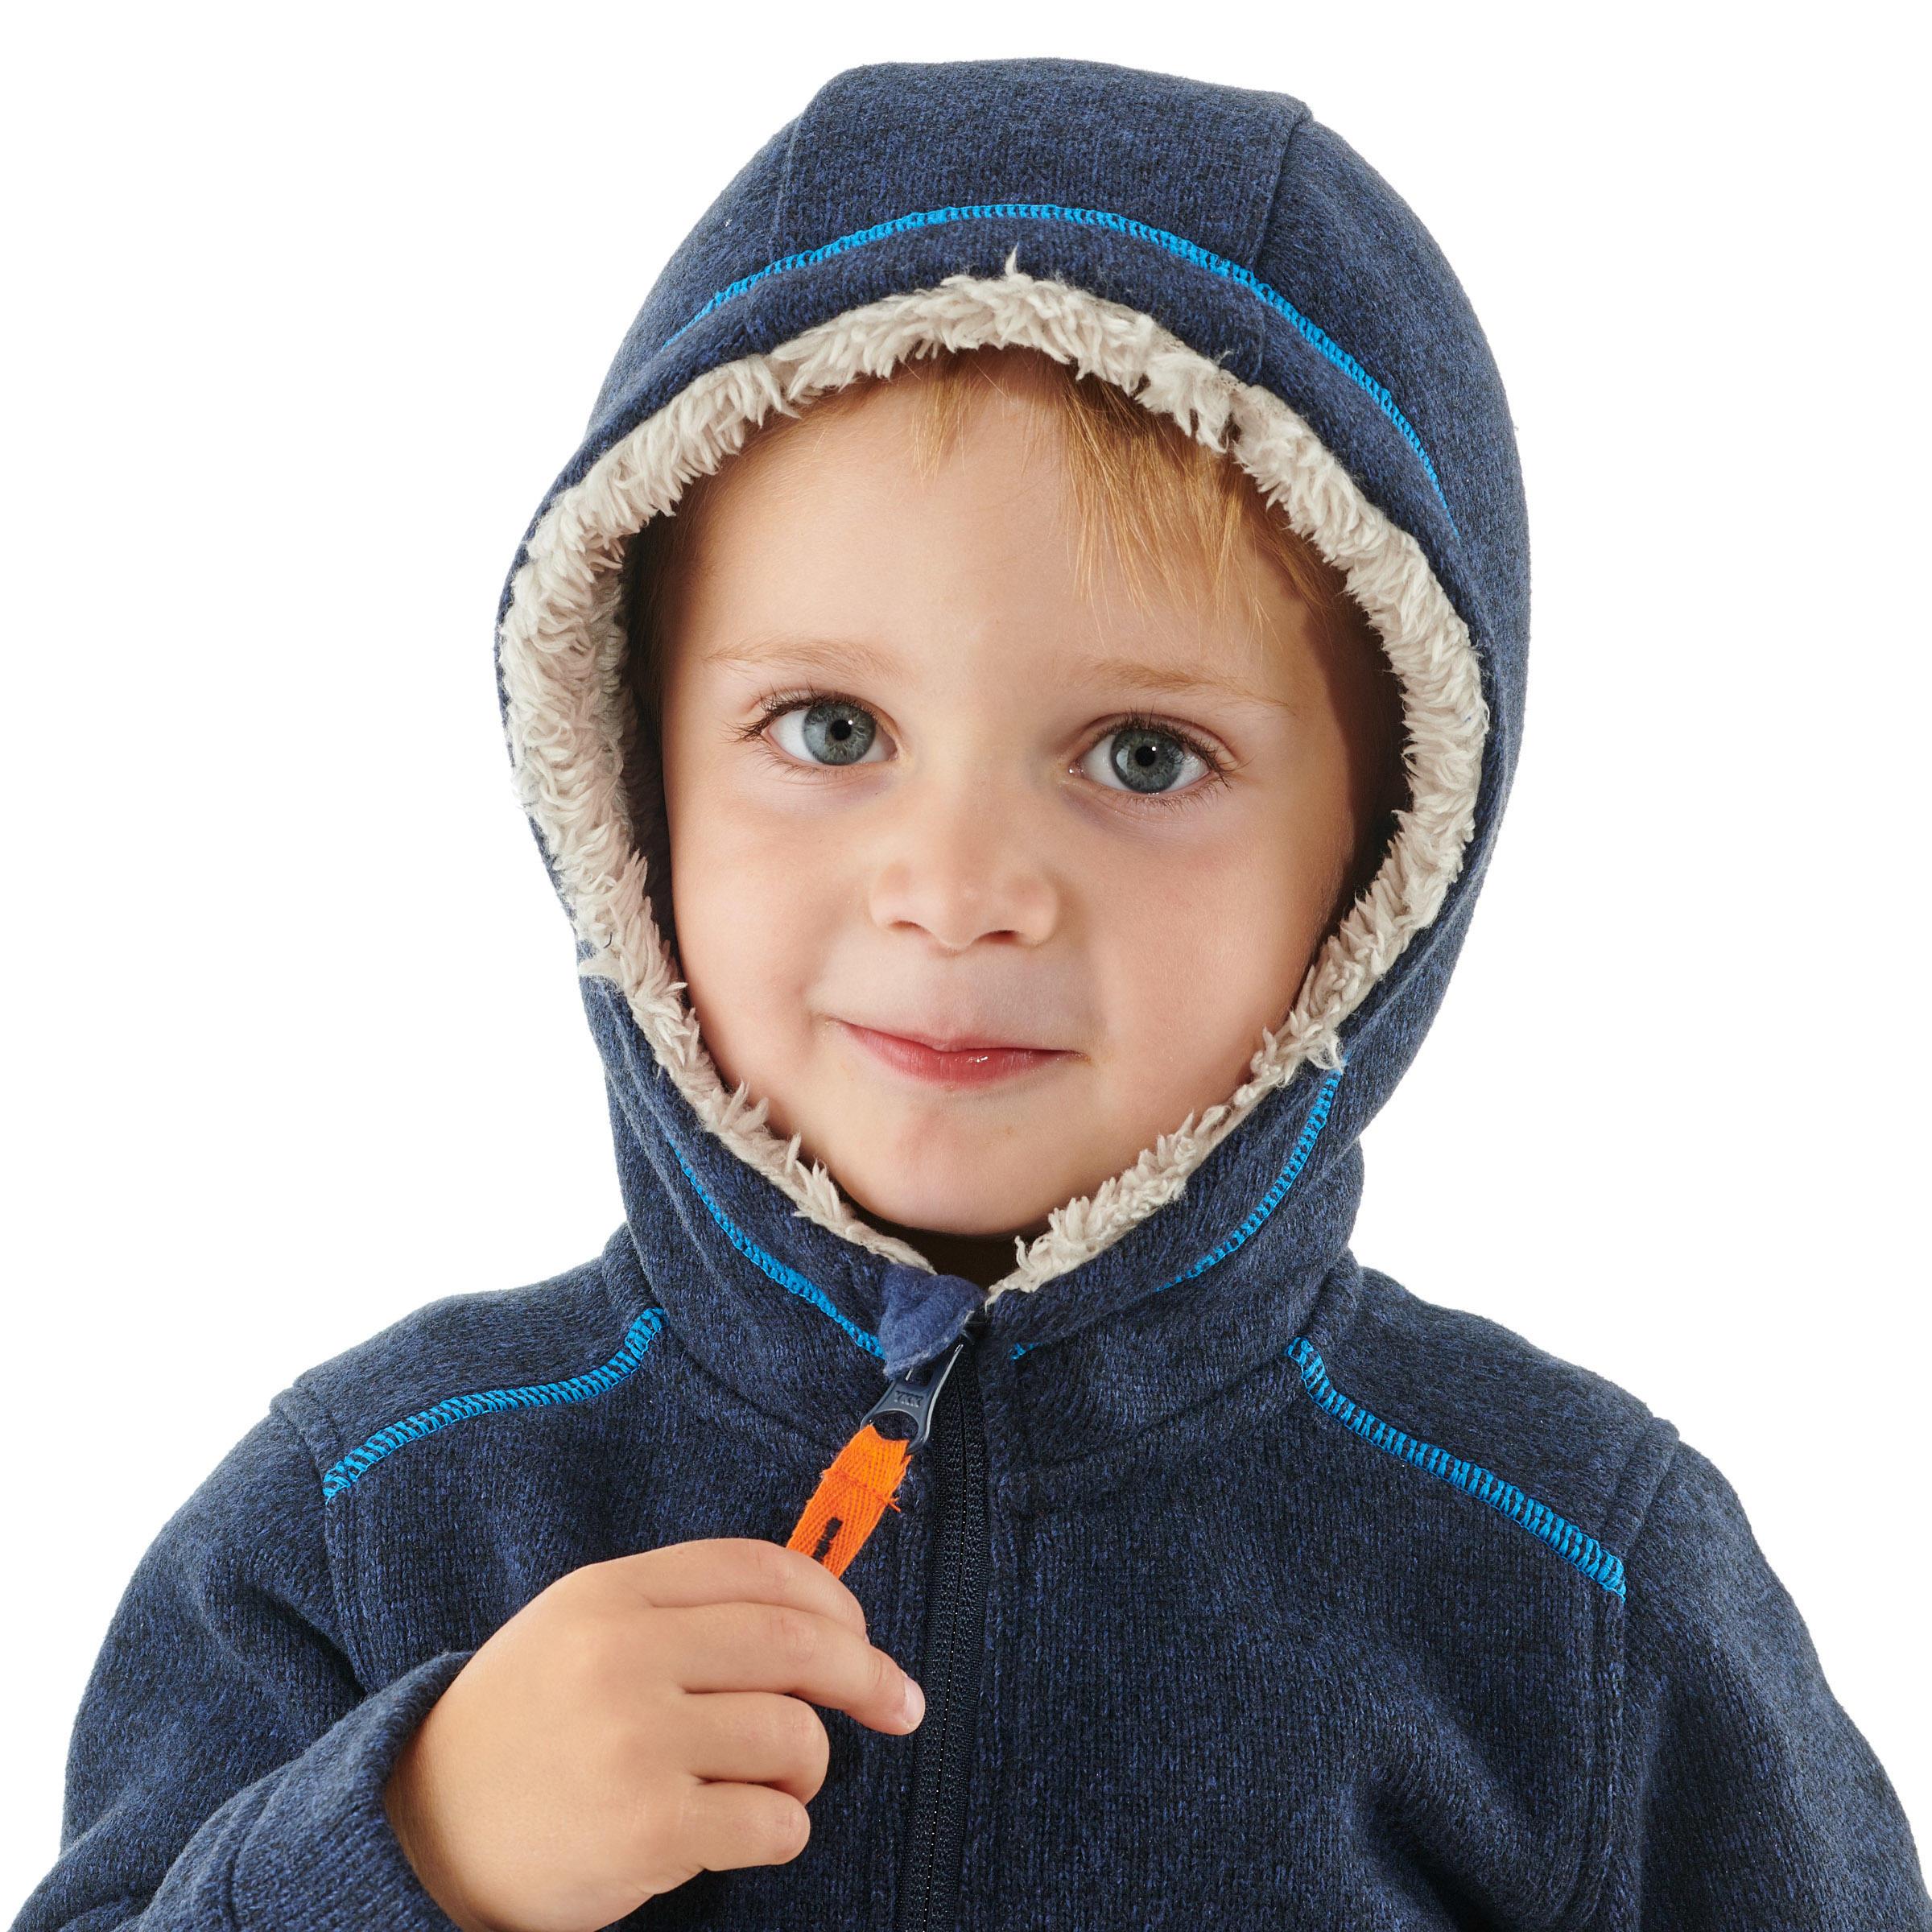 SH100 Warm Child's Snow Hiking Fleece Jacket -Navy